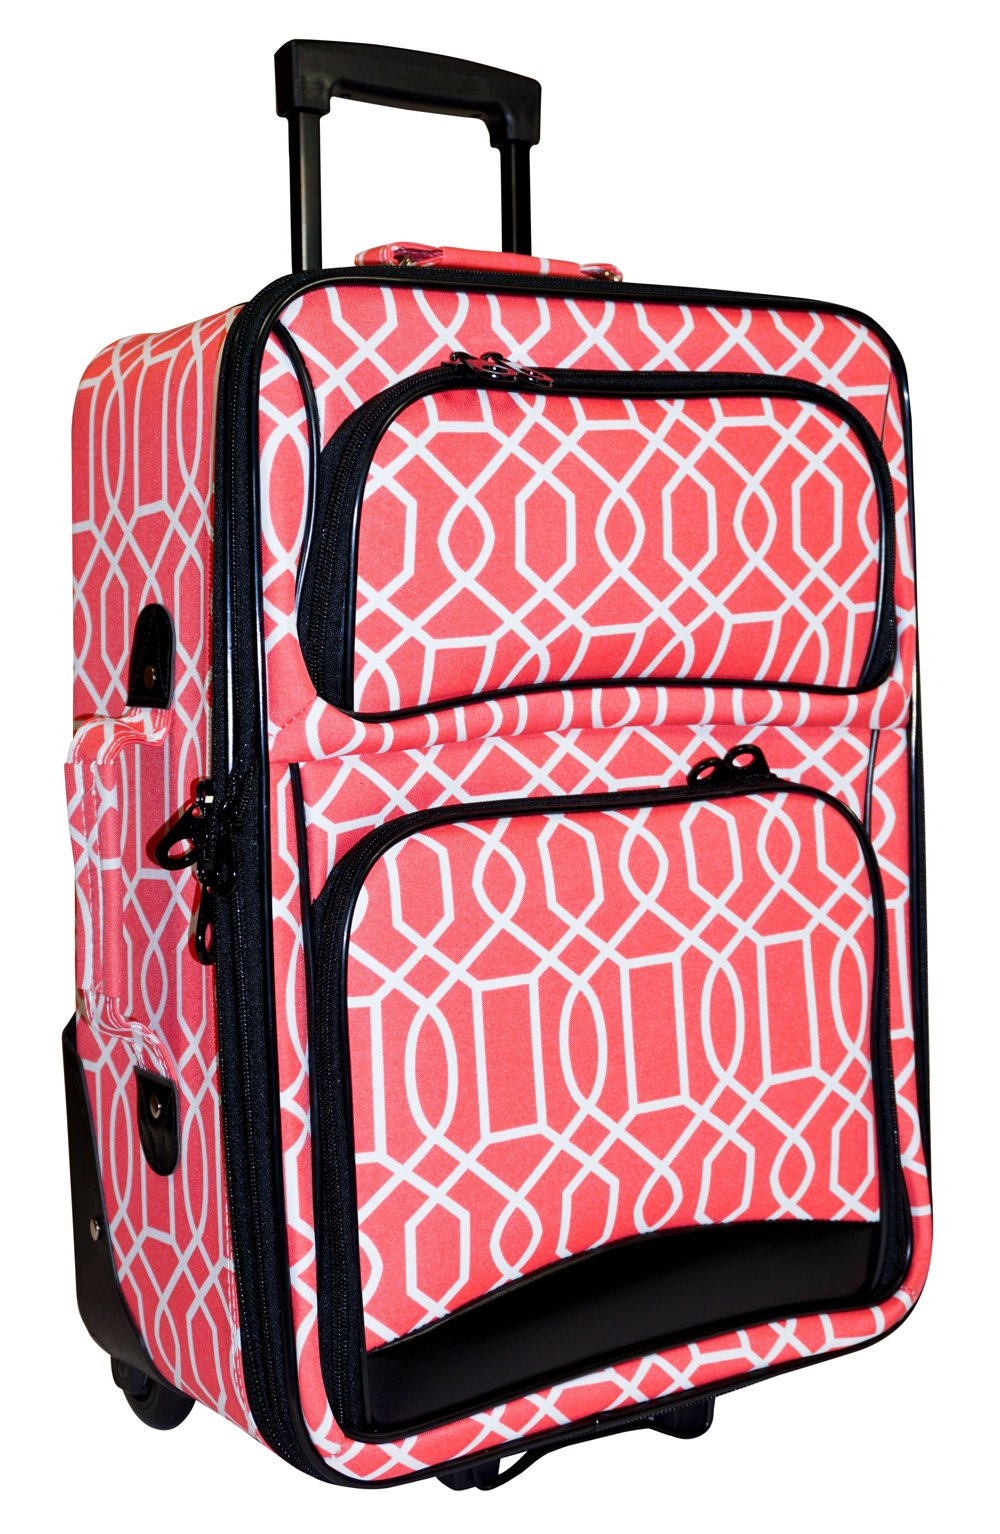 Ever Moda Geometric Carry On Luggage